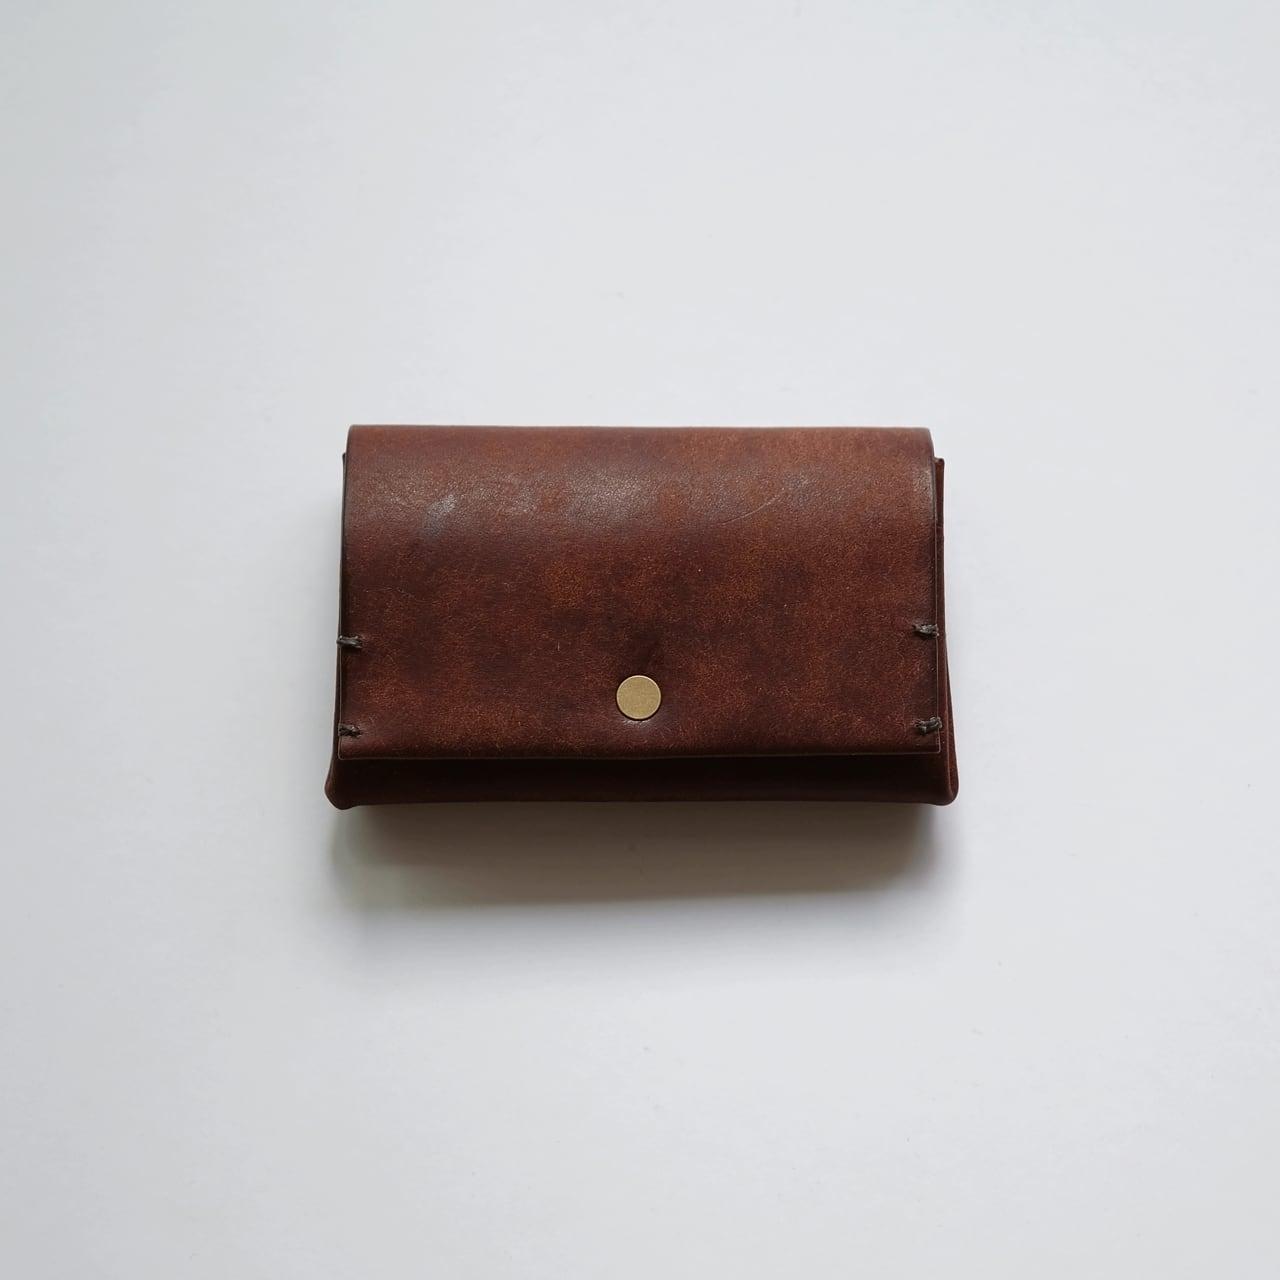 bellowsfold wallet - db - プエブロ